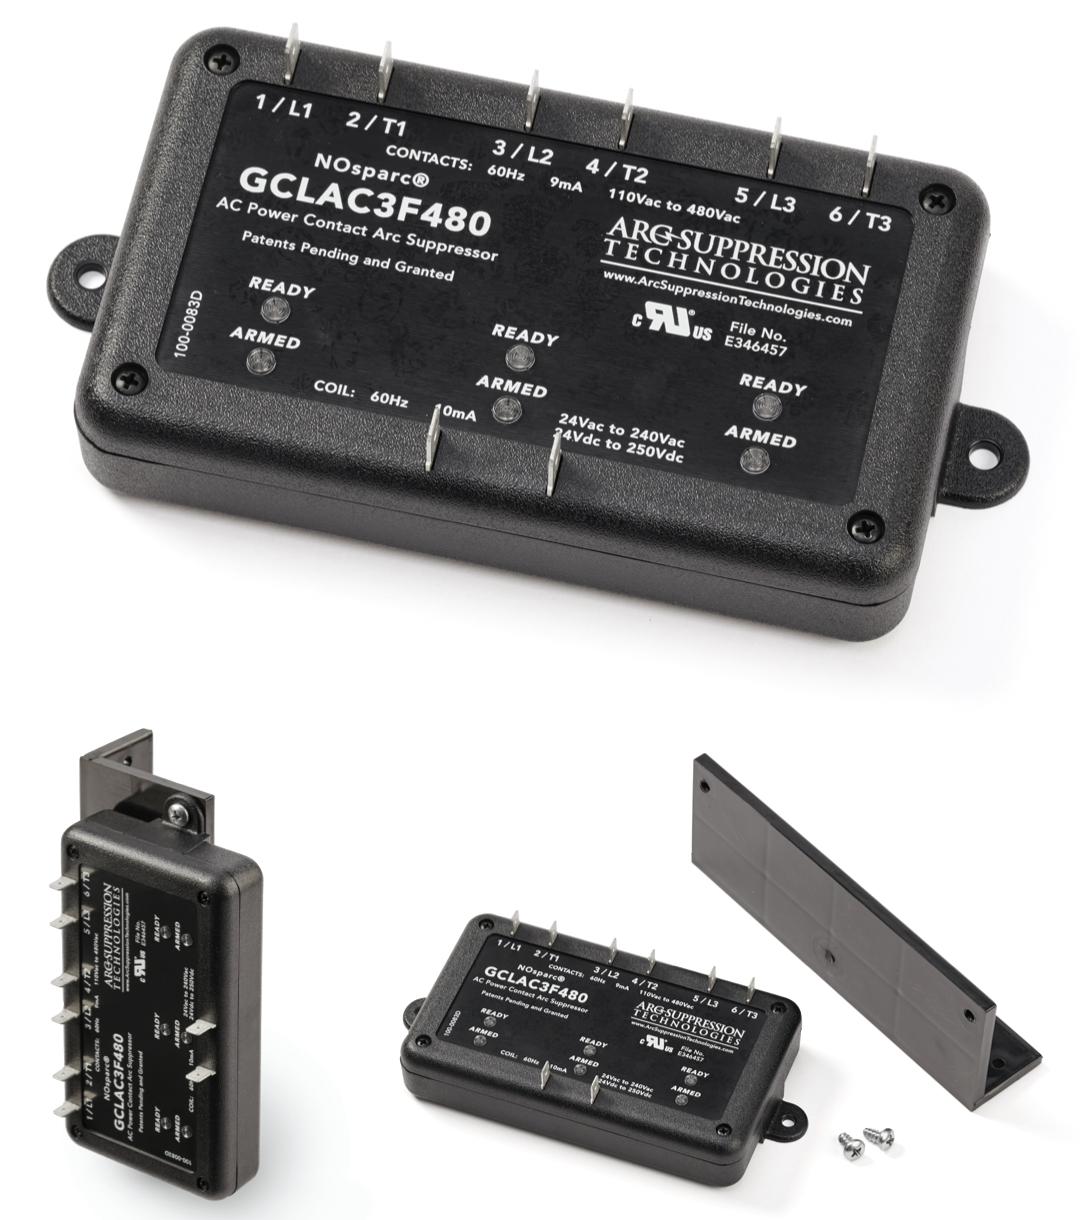 AC Nosparc Products